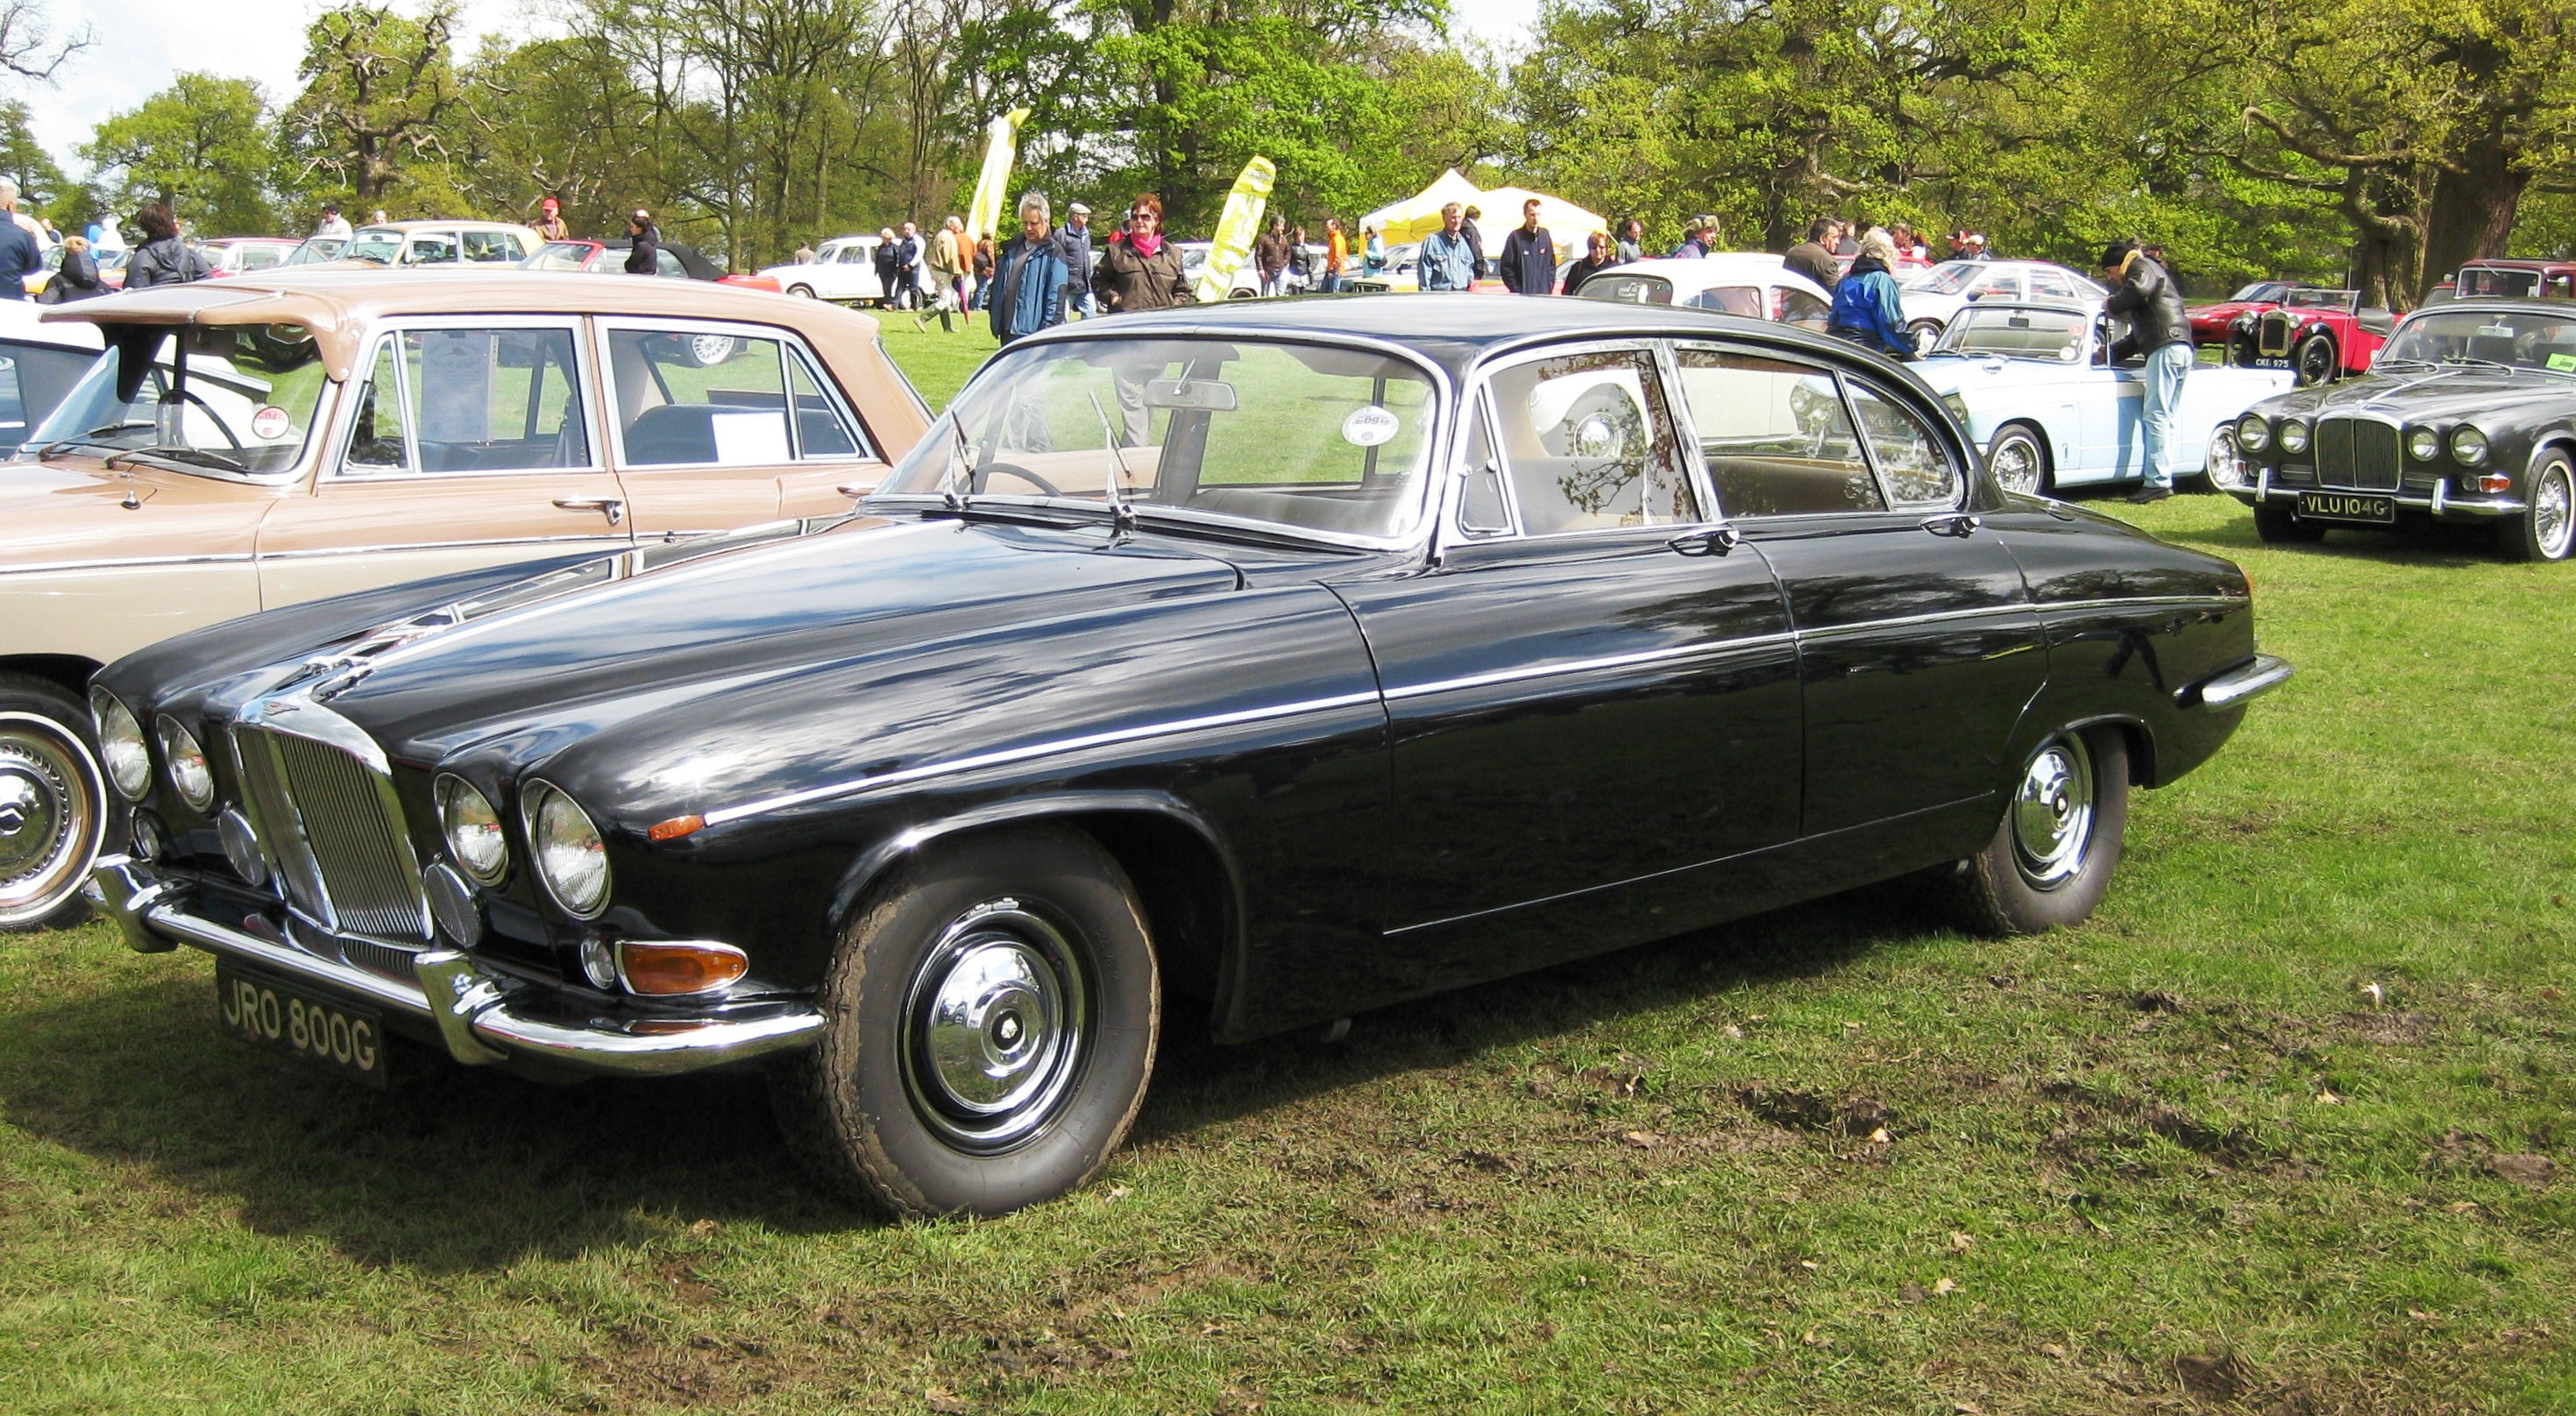 file:jaguar 420g reg april 1969 4235 cc overlookedjaguar 420